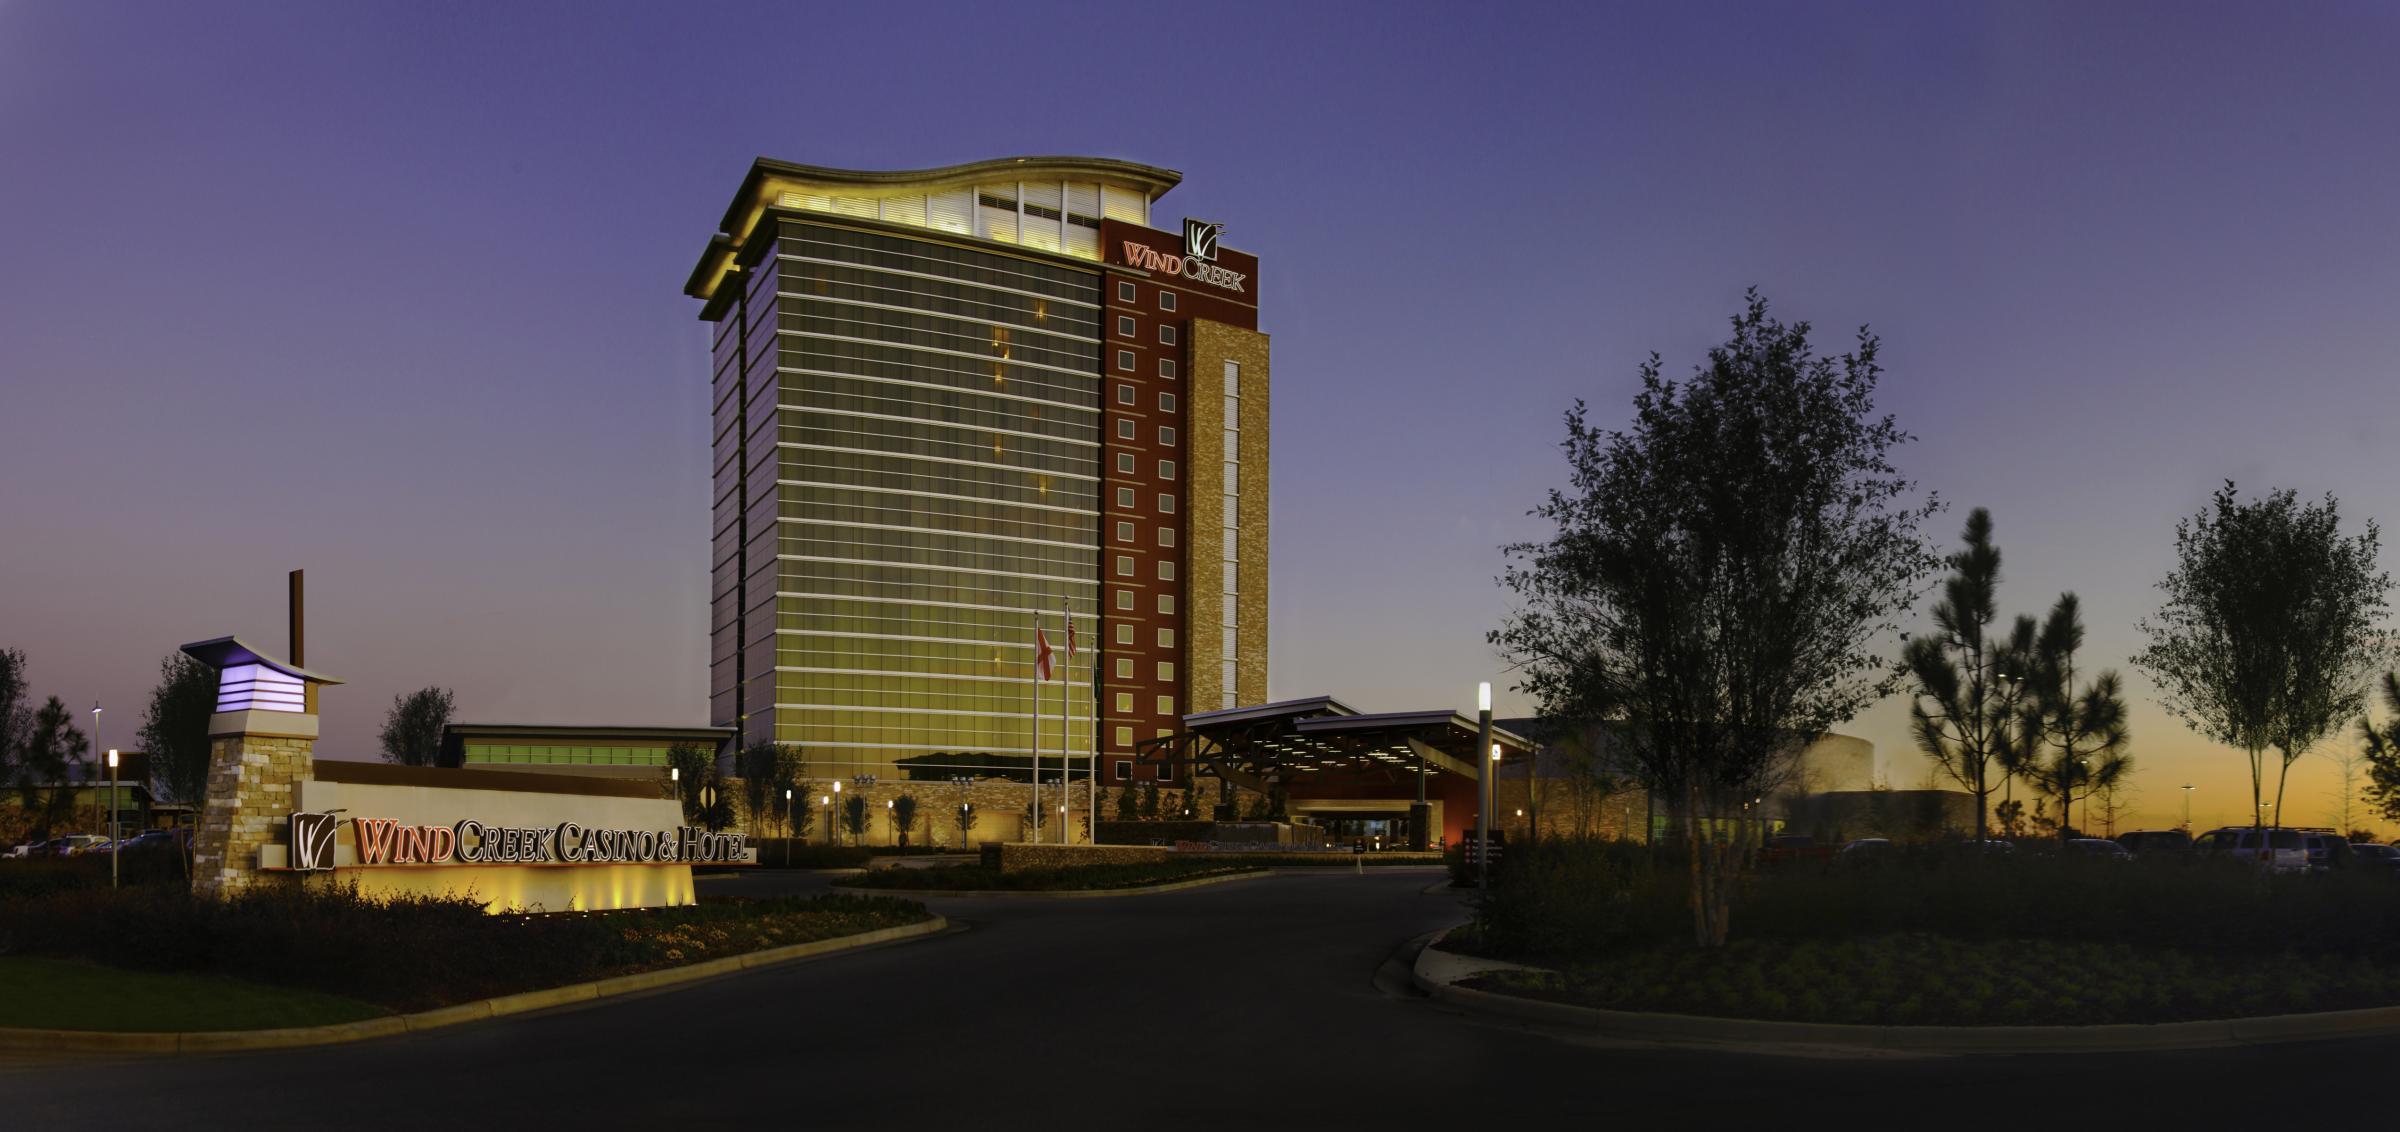 Atmore casino concerts